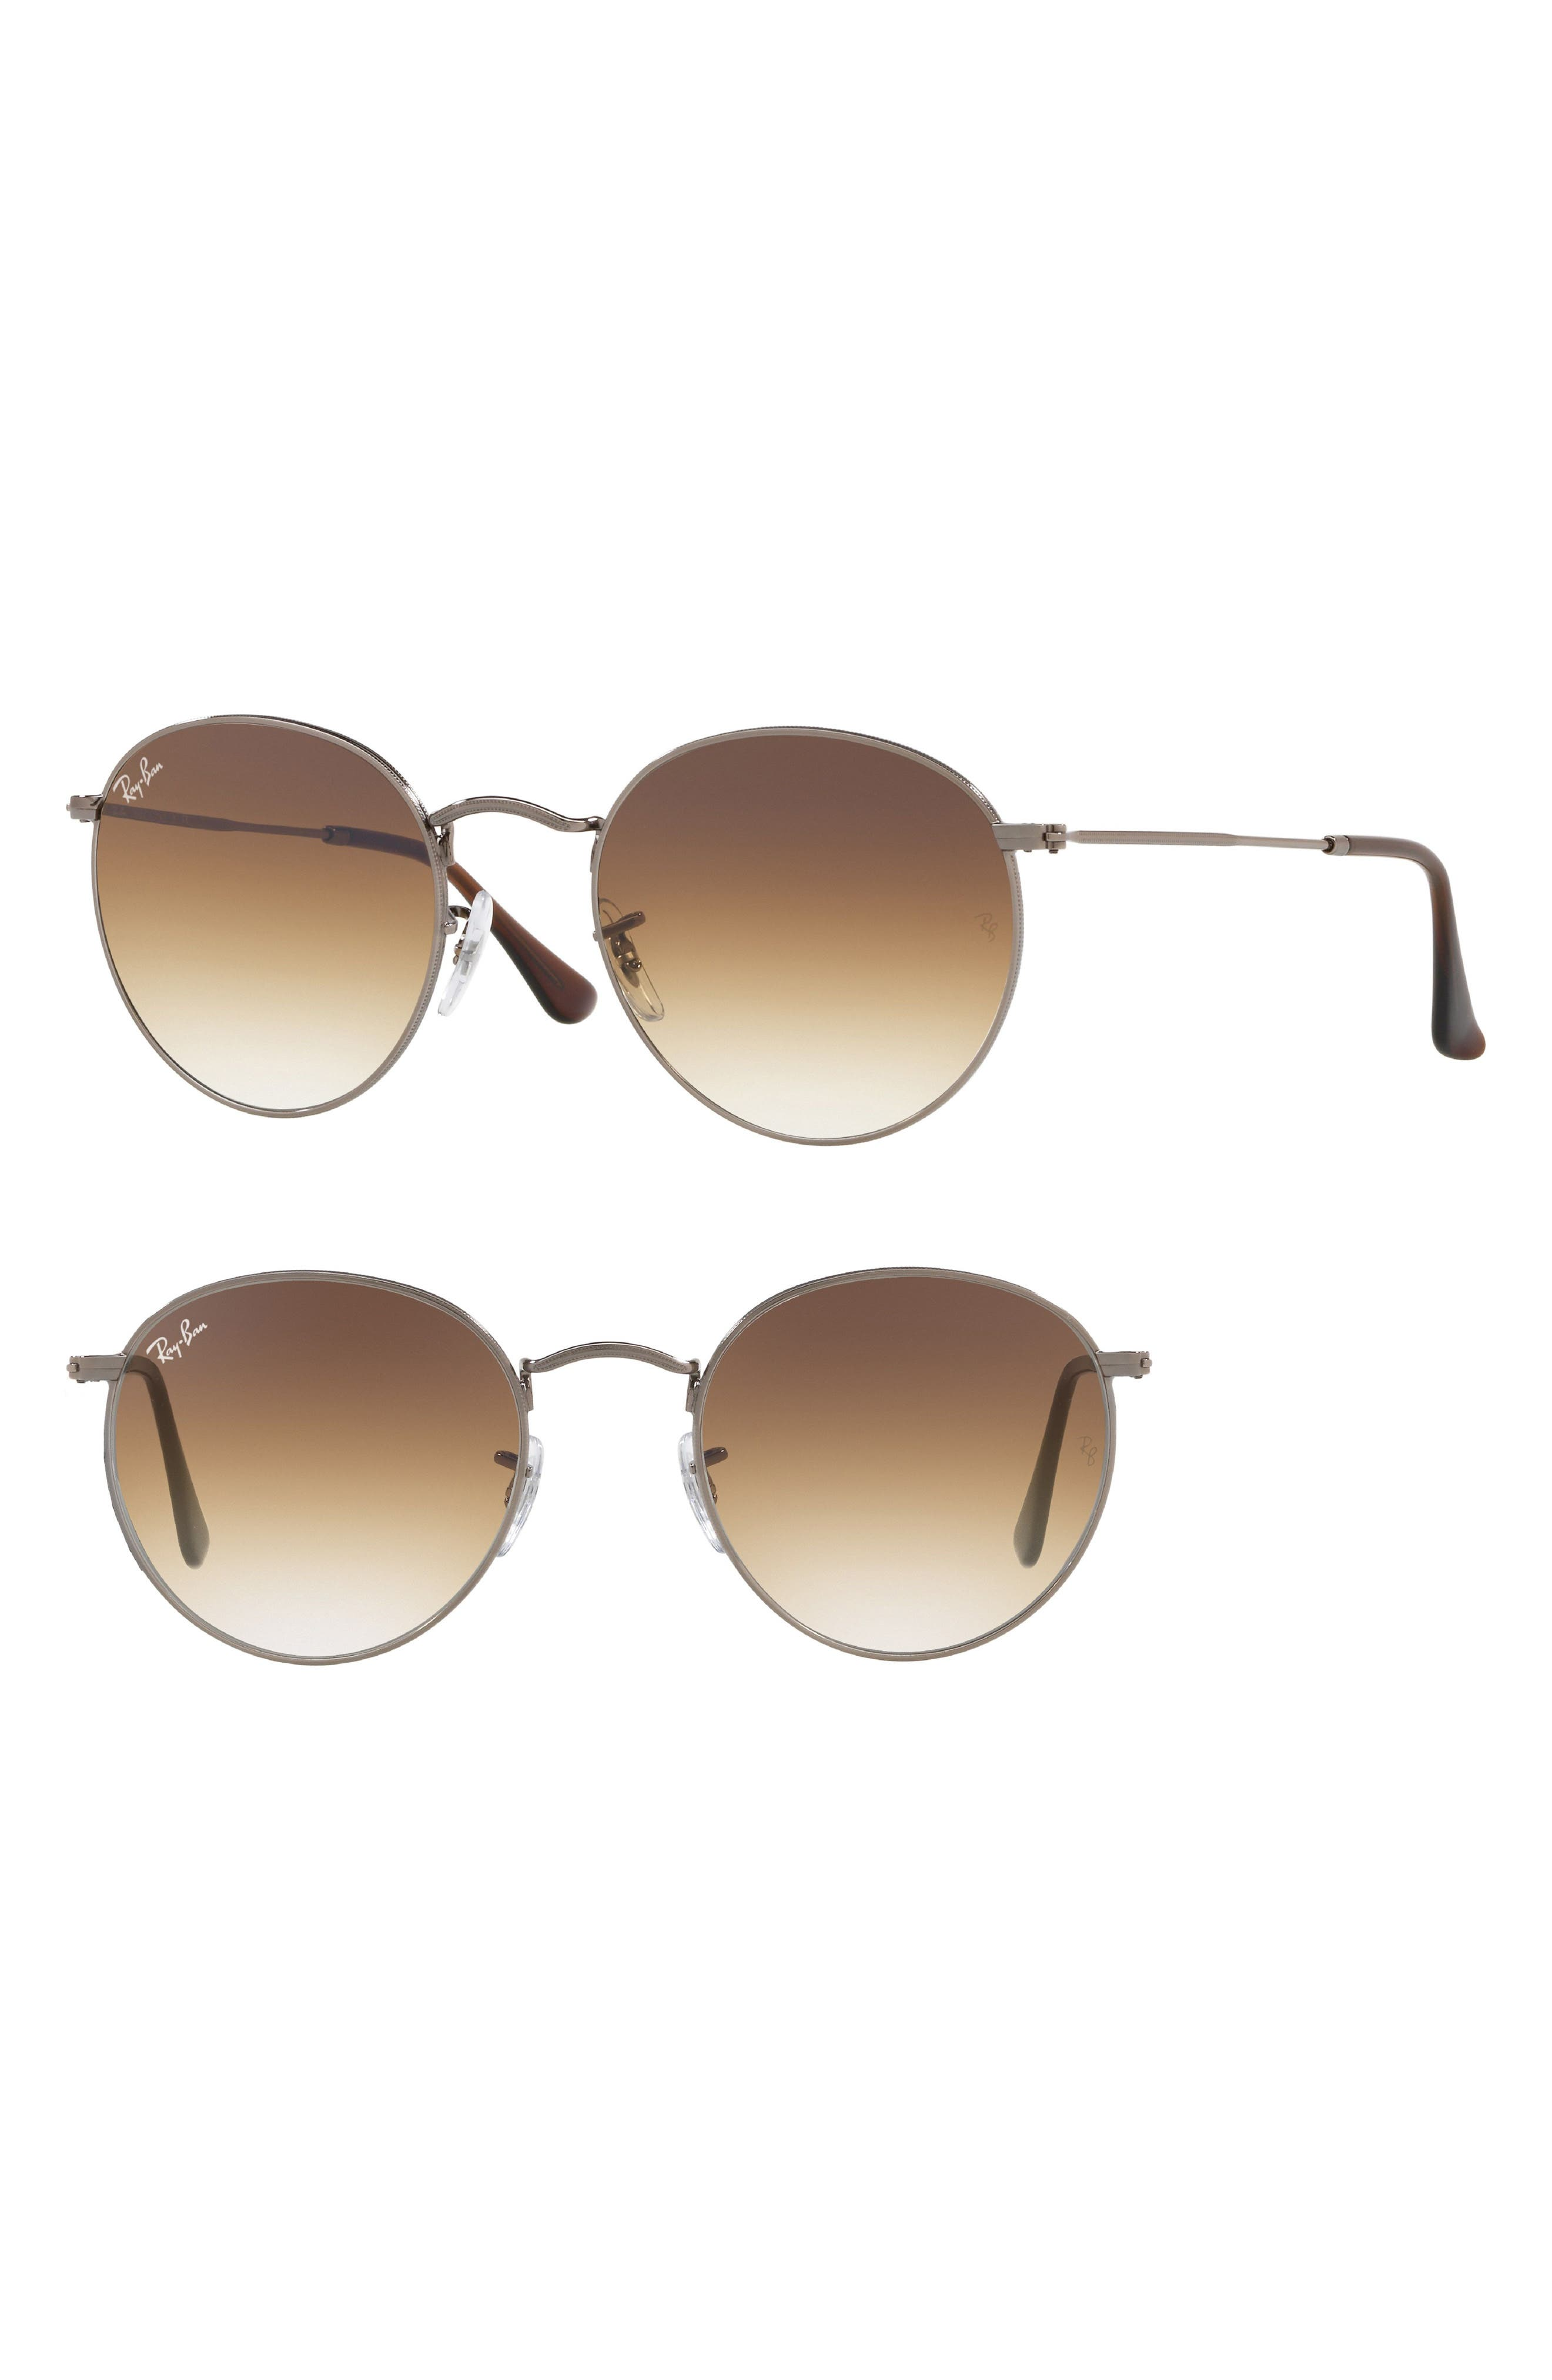 Phantos 50mm Gradient Sunglasses,                         Main,                         color, Gunmetal